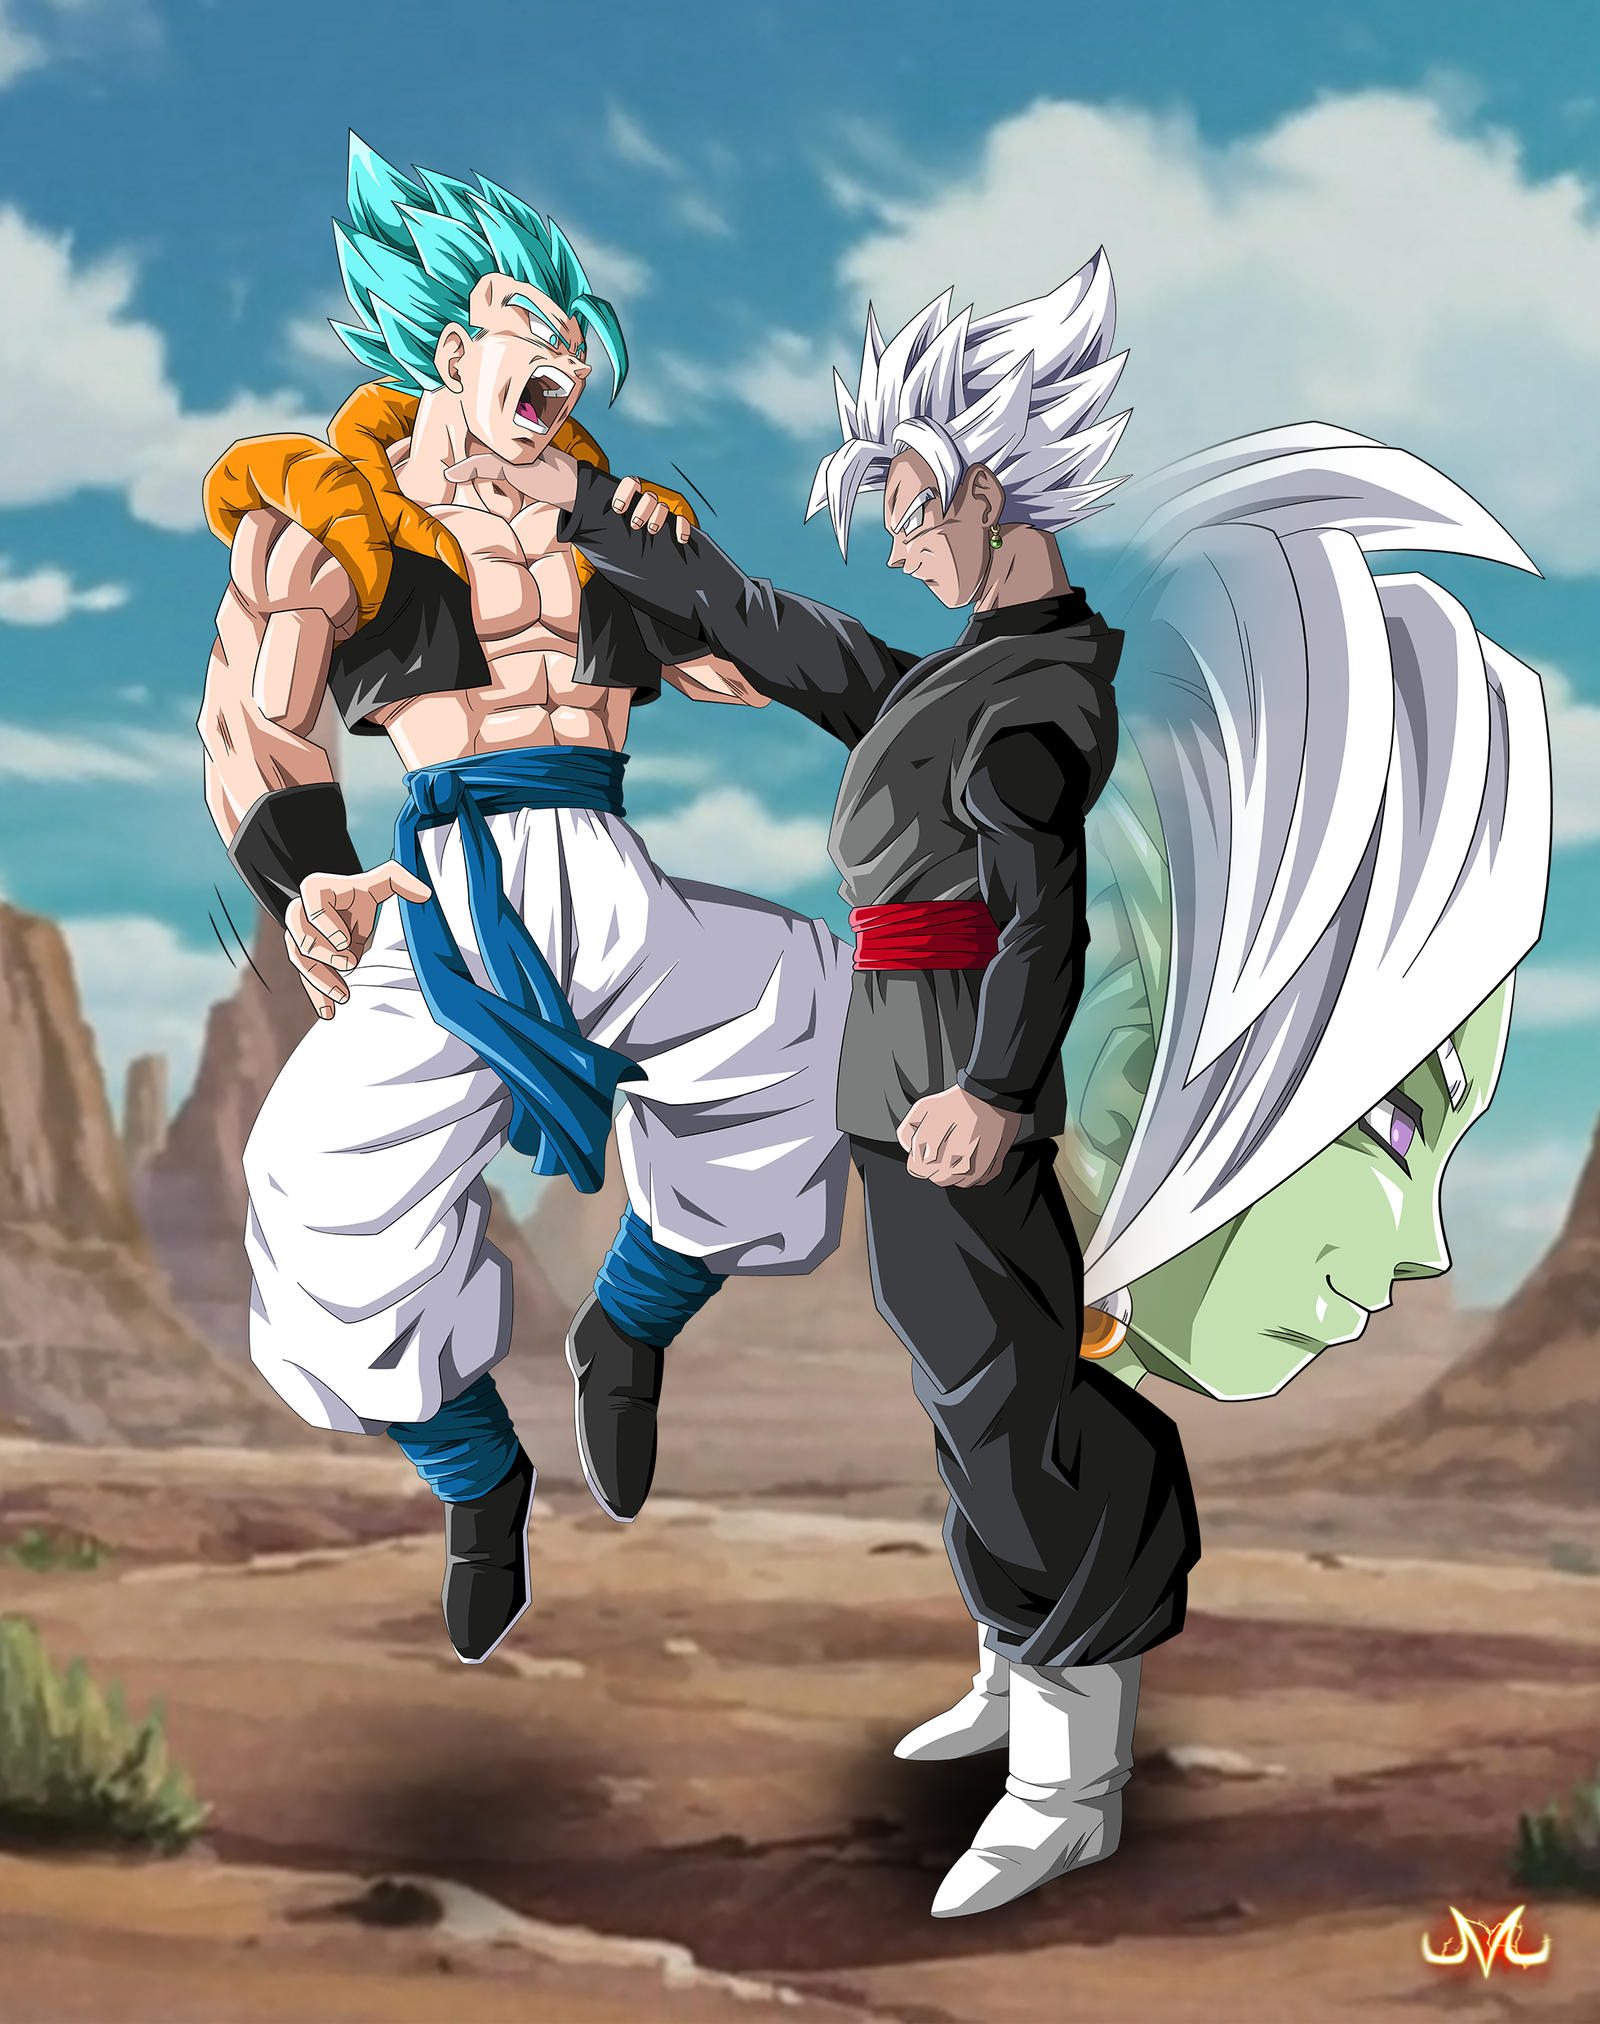 Black Goku Vs Gogeta By Maniaxoi On Deviantart